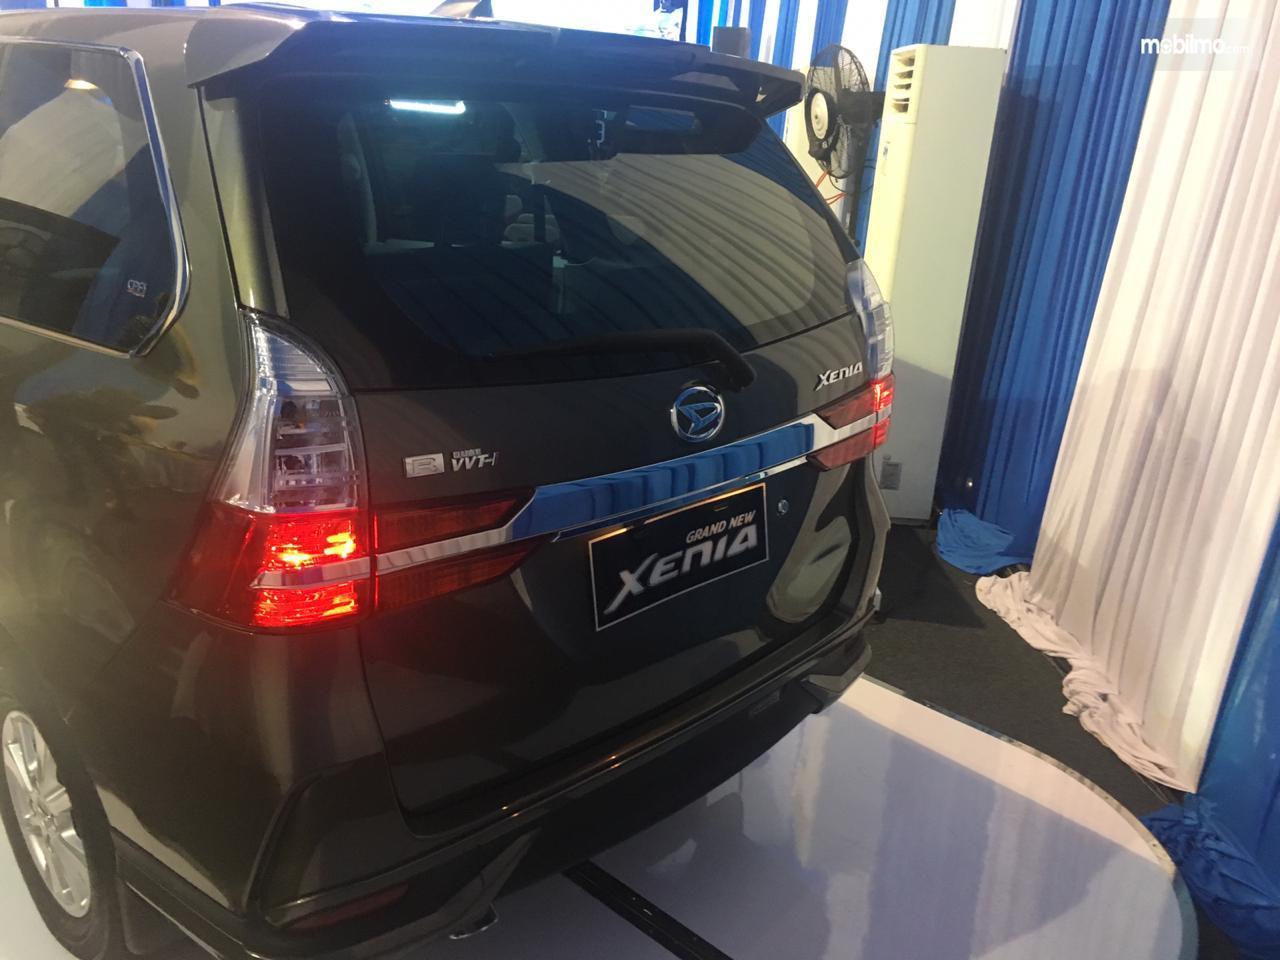 Tampilan belakang sebuah Daihatsu Grand New Xenia R A/T 1.3 2019 berwarna abu-abu